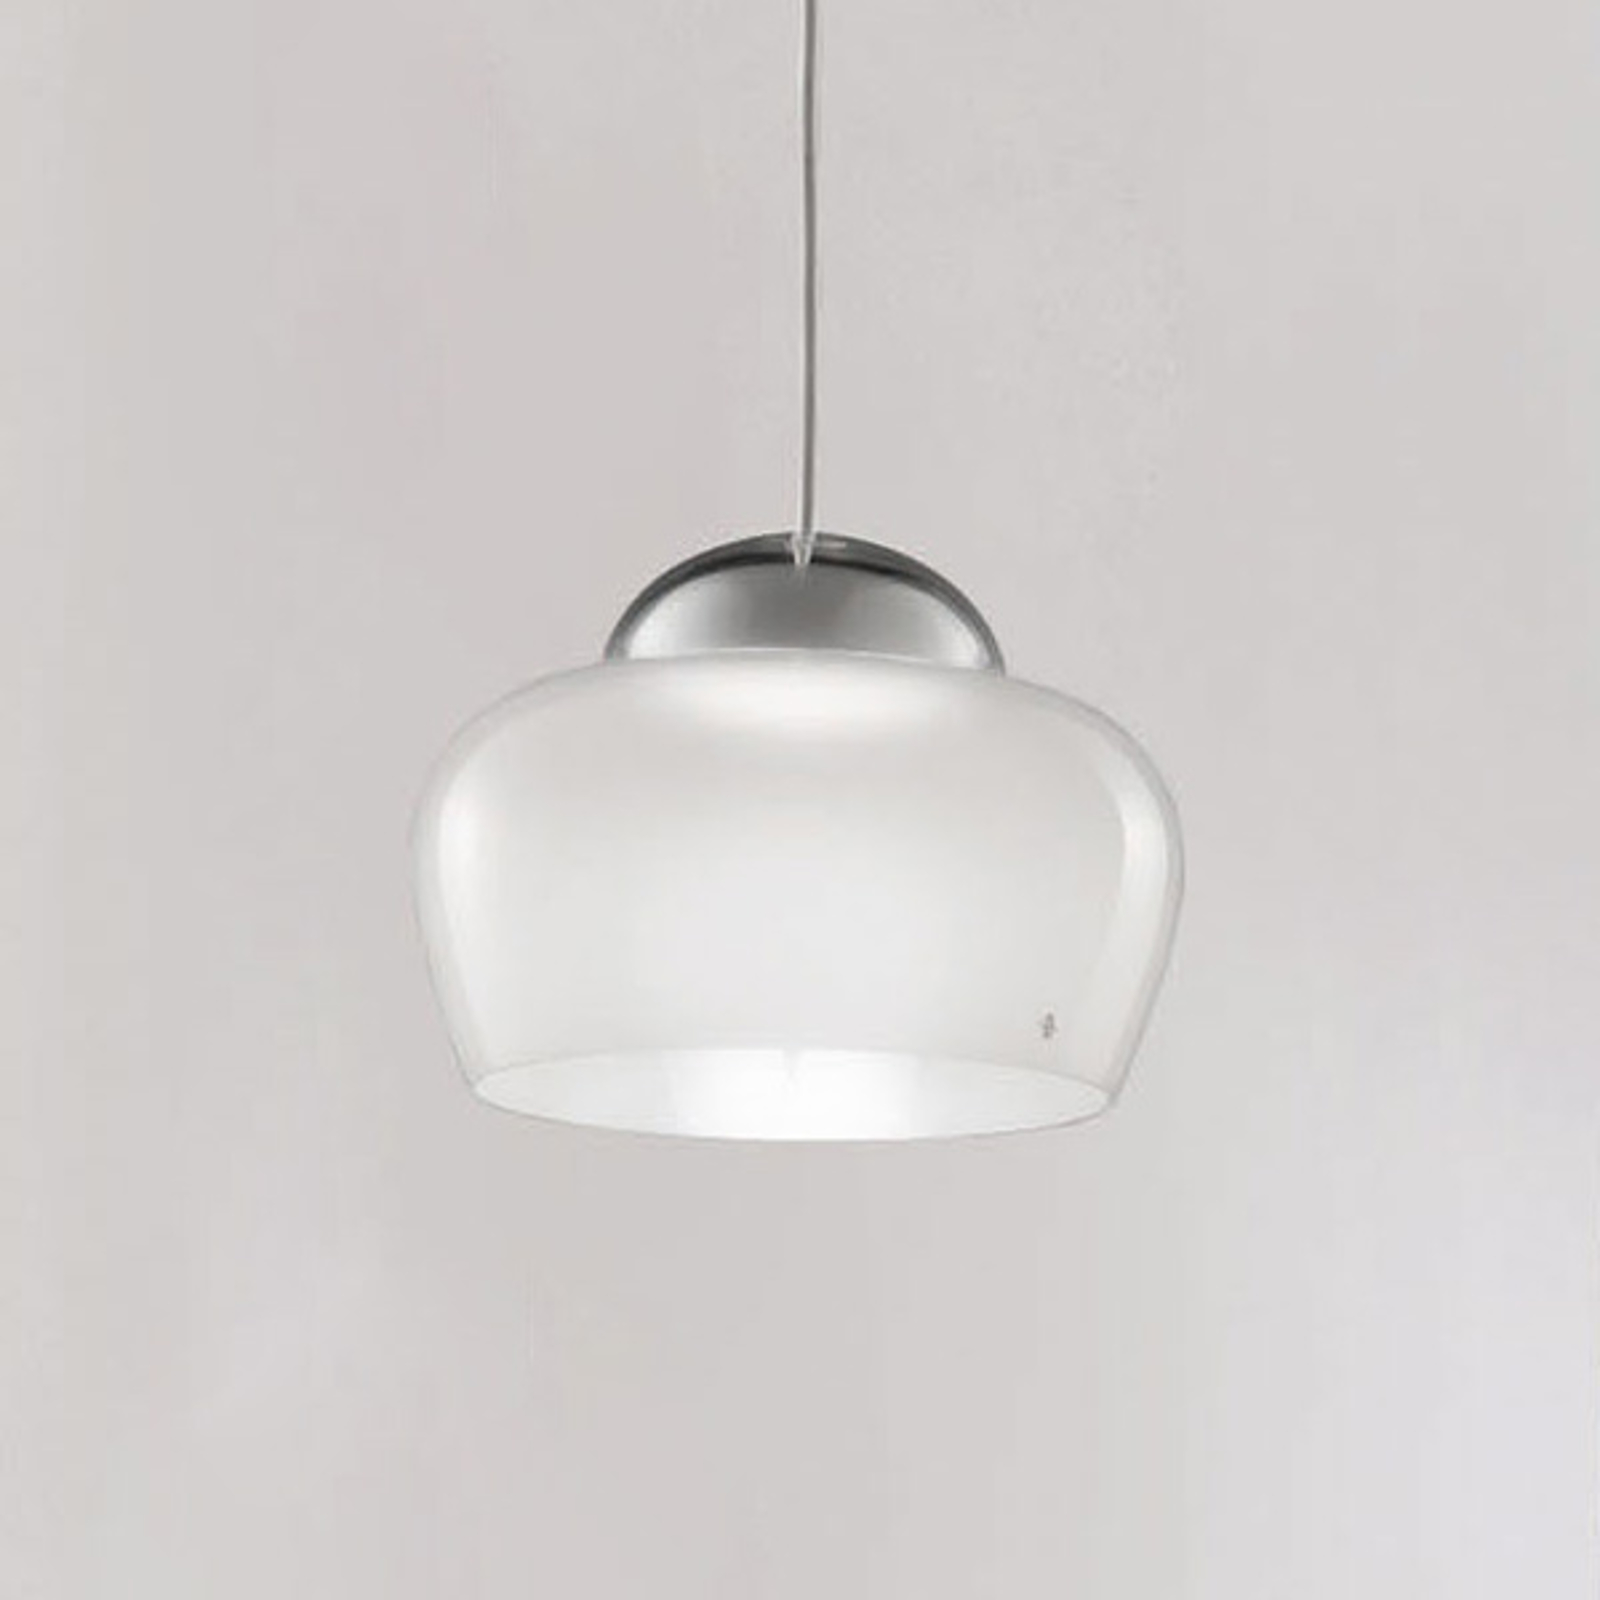 Lampa wisząca LED Cristallina biała